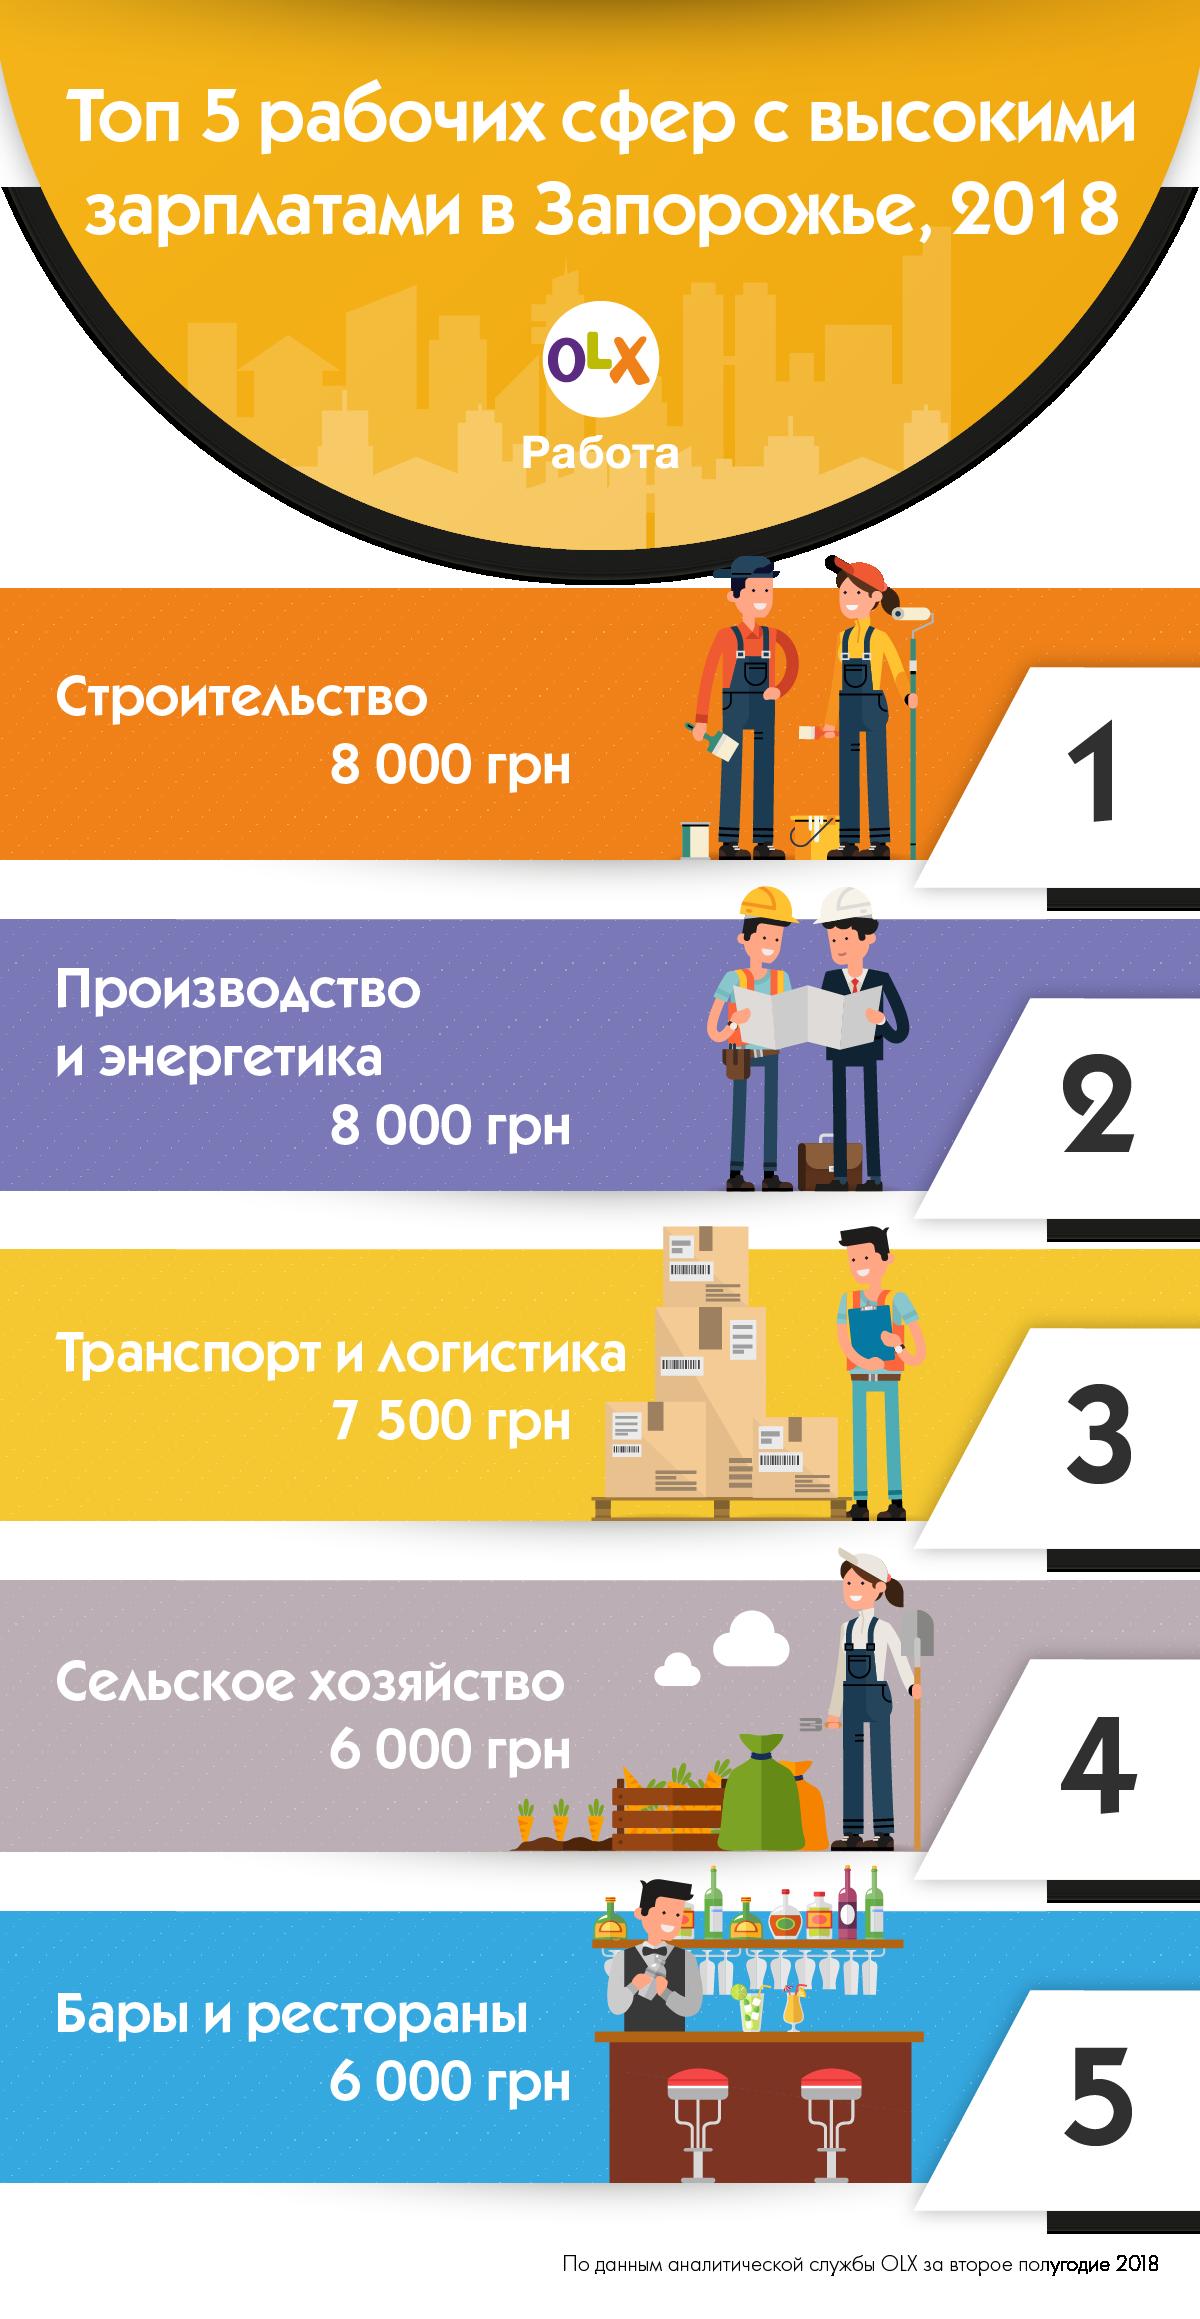 infografika_olx-rabota_top-5-rabochih-sfer-v-zaporozhe